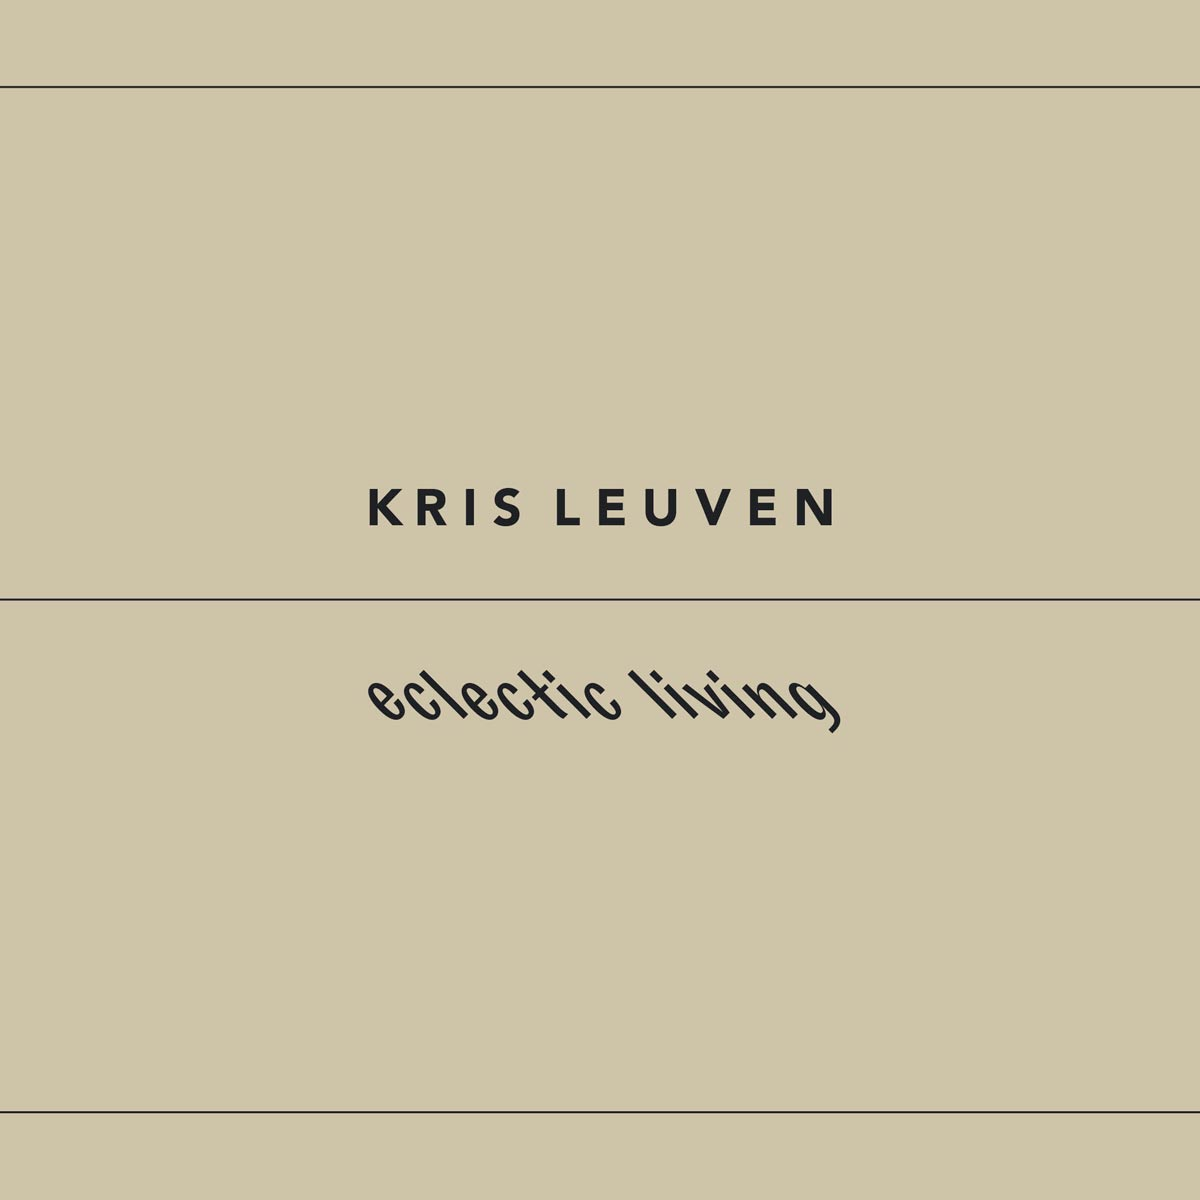 Kris Leuven Interior Designer Branding + Logo Design